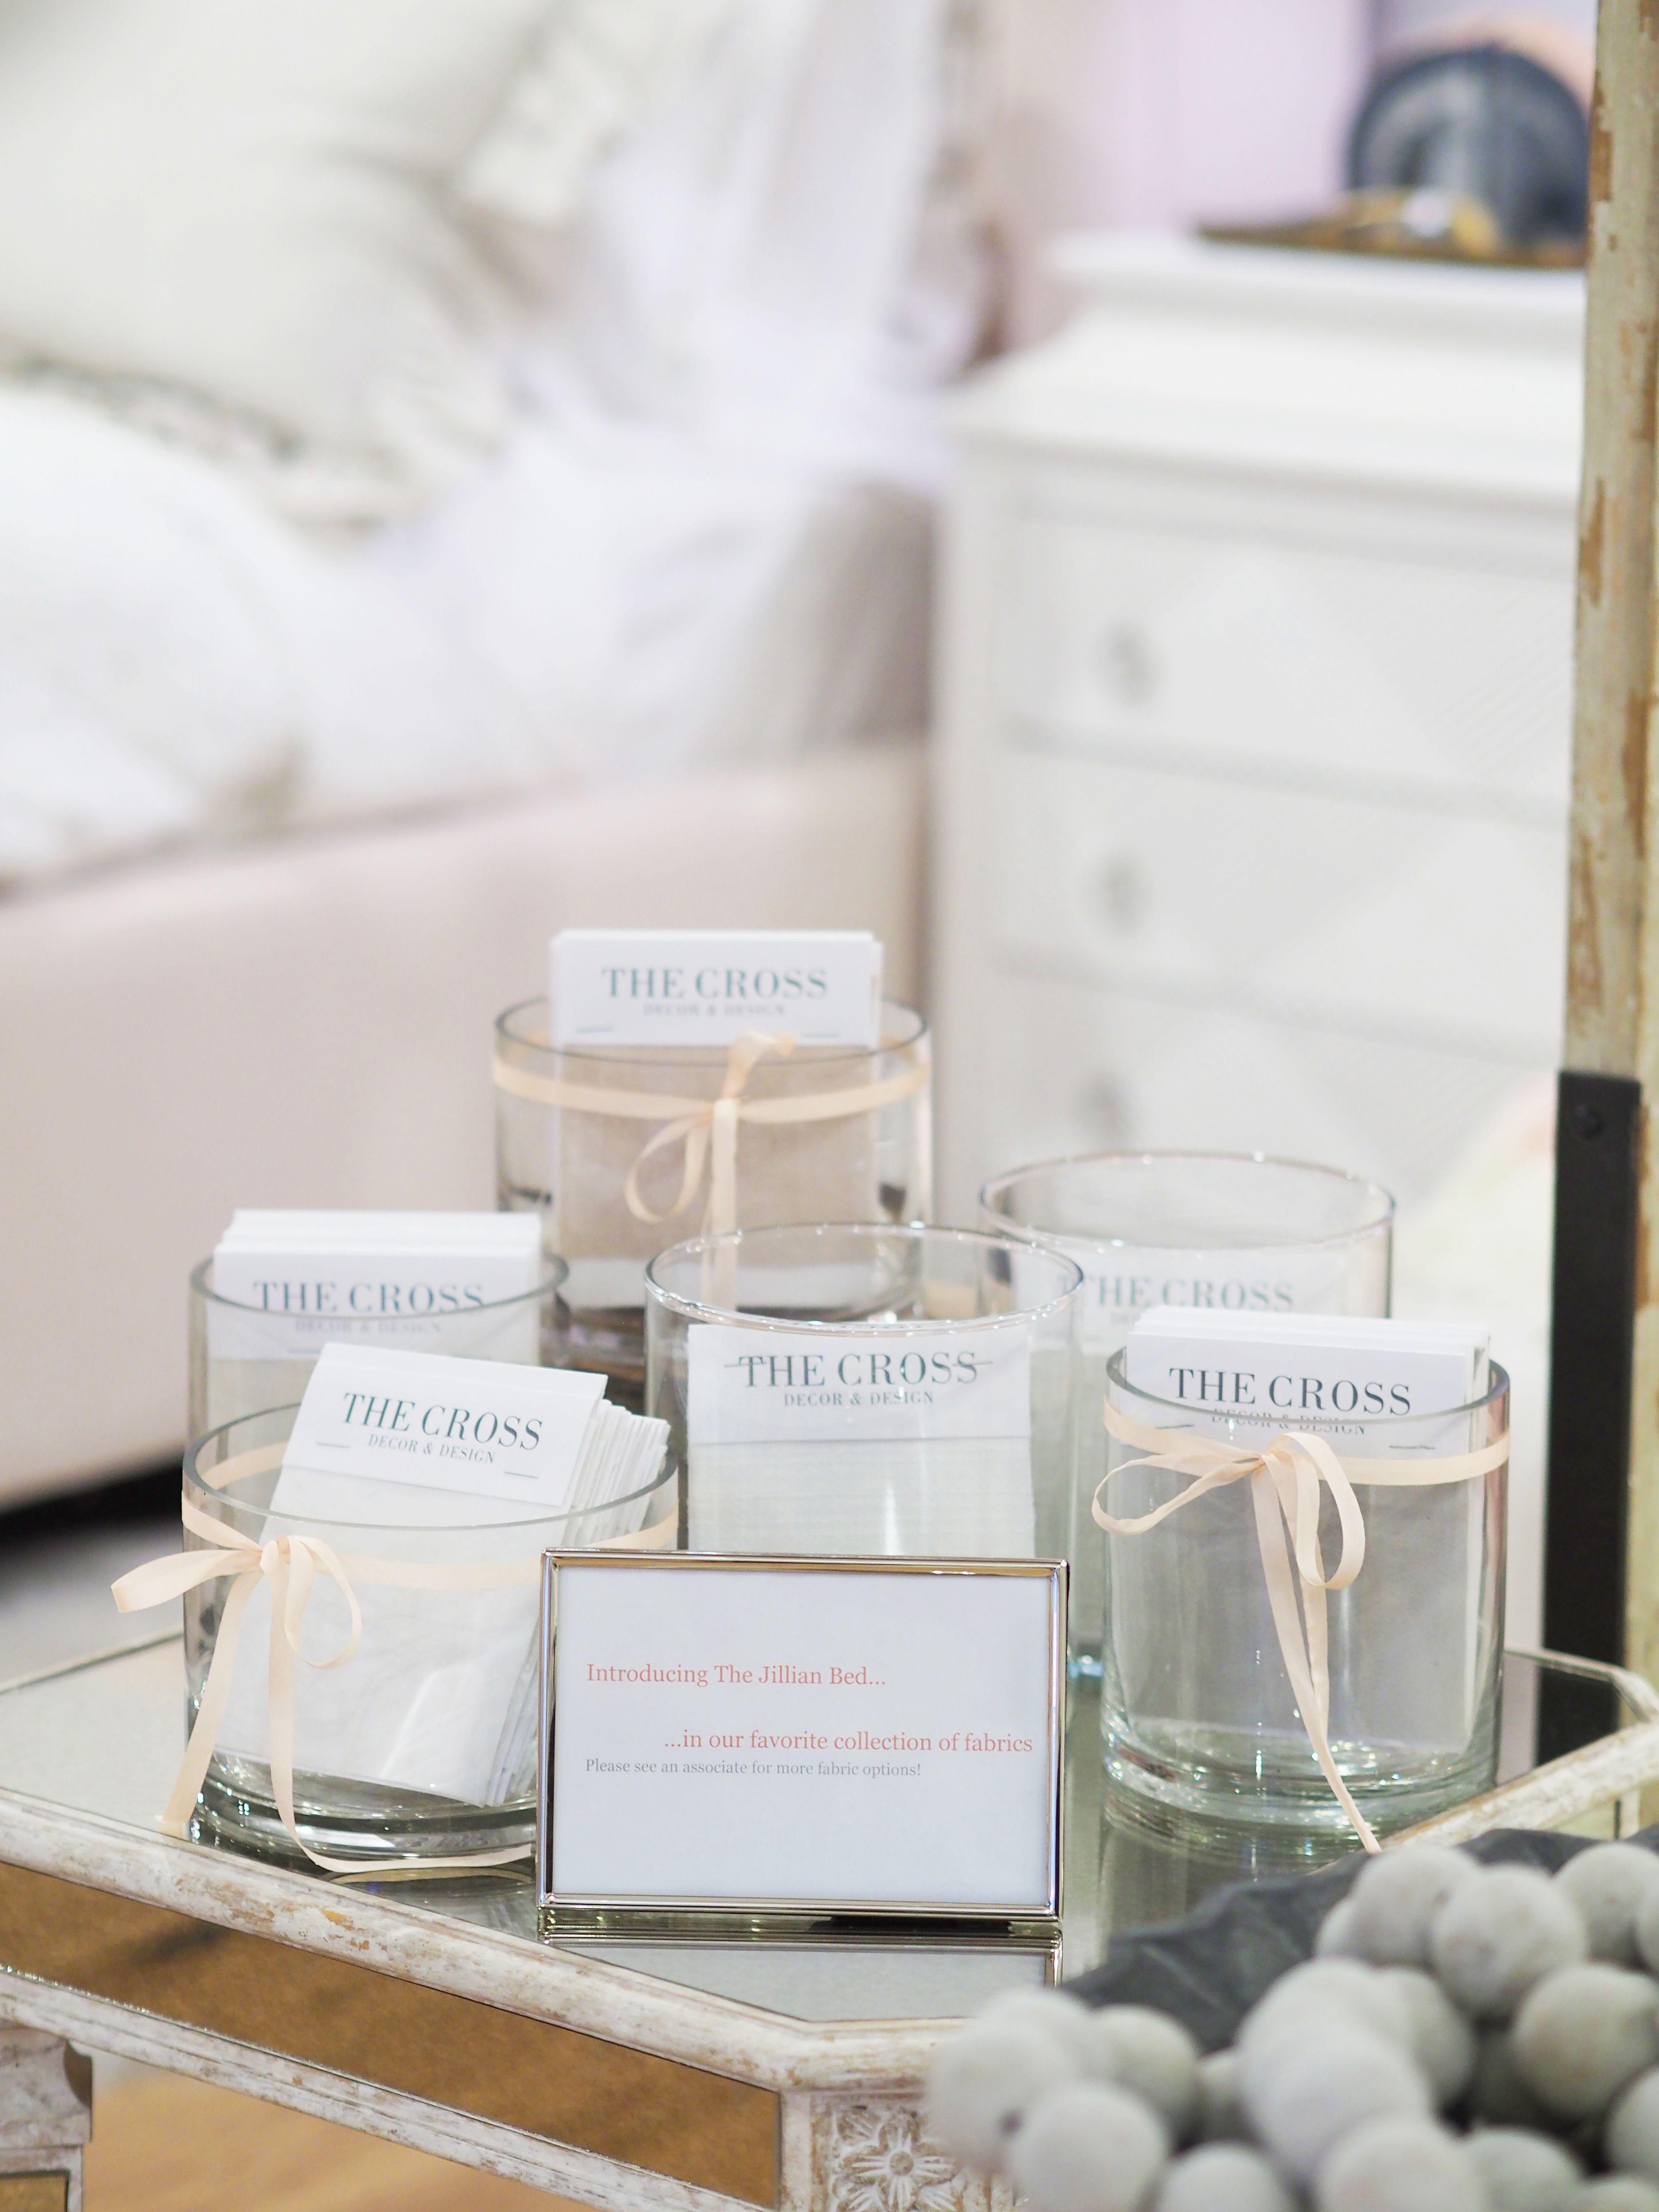 #JillianHarris #home #decor #style #design #accessories #fabric  #fabricoptions #custom #furniture #bed